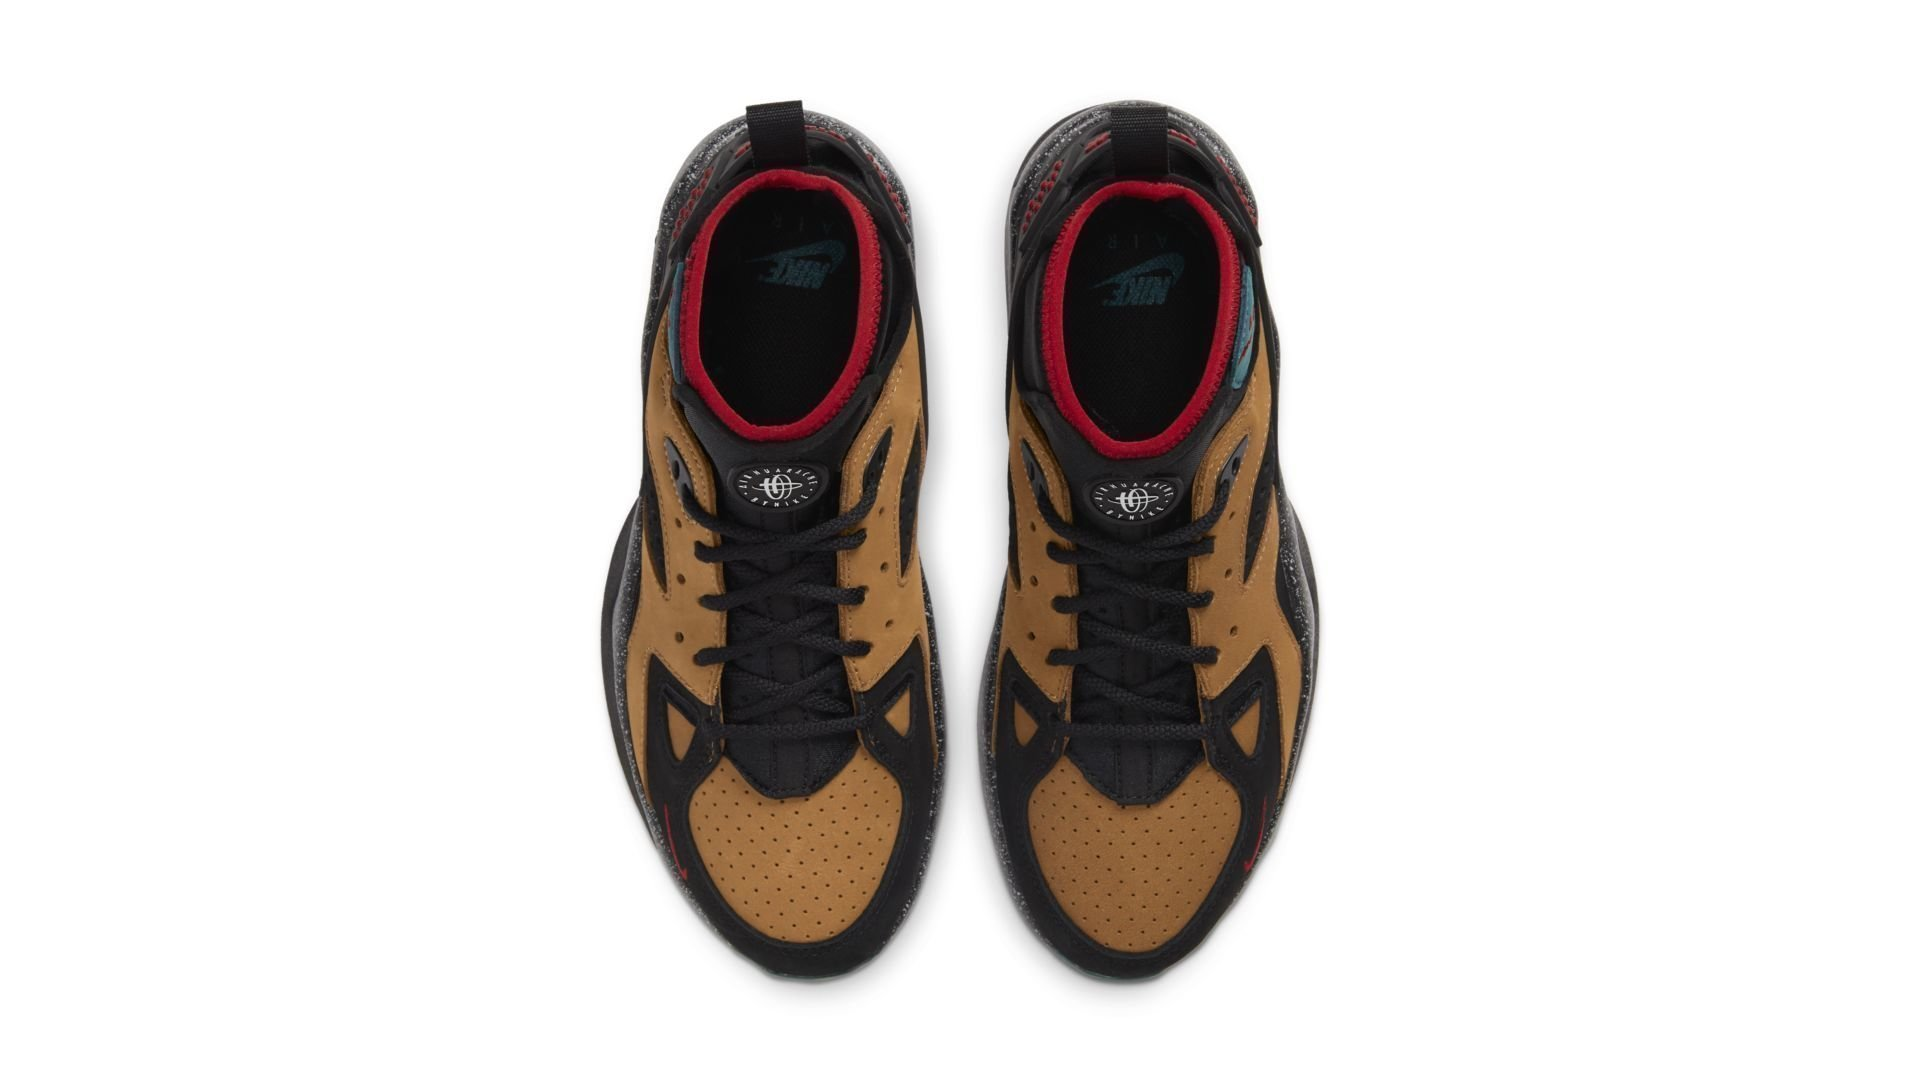 Nike Air Mowabb Olivia Kim No Cover (W) (CK3312-001)